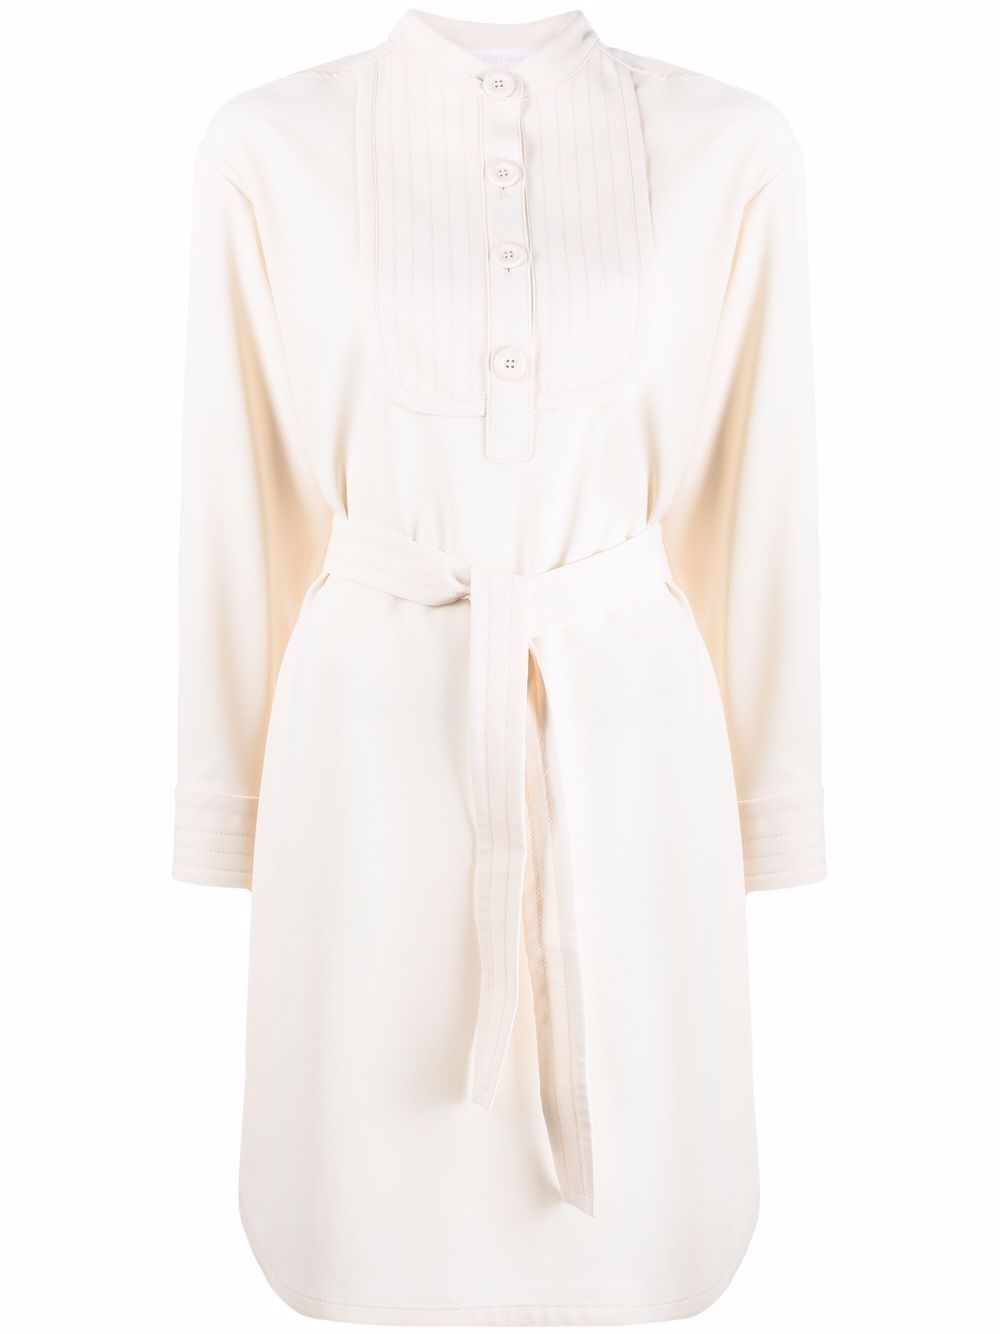 See by chloé abiti bianco